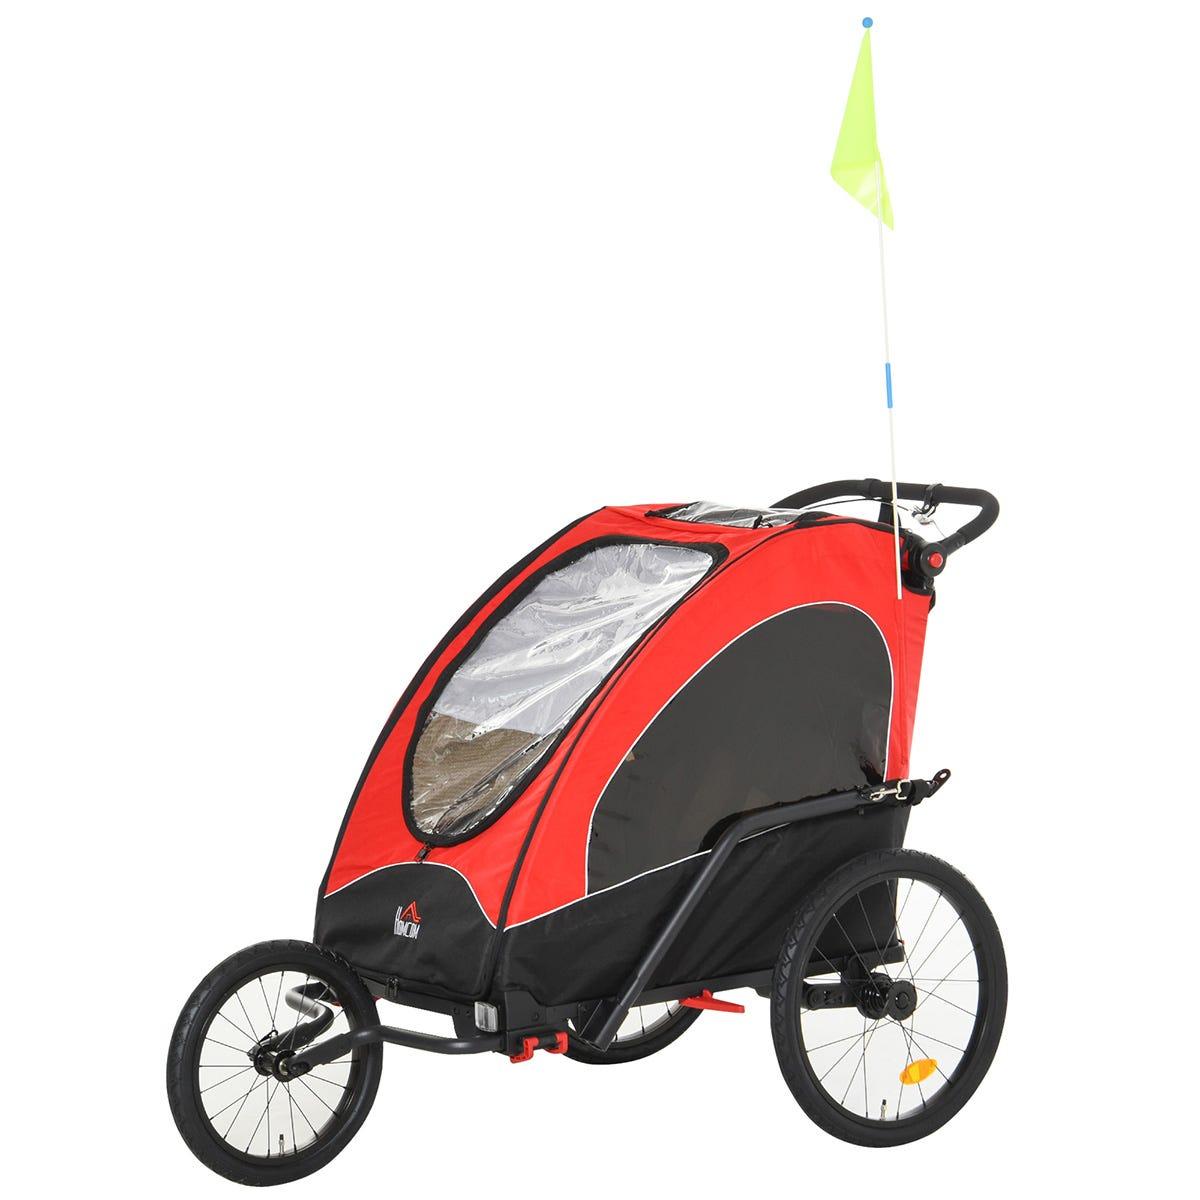 Reiten 3-in-1 Kids 2 Seater Bike Trailer & Stroller with Shock Absorber - Red/Black